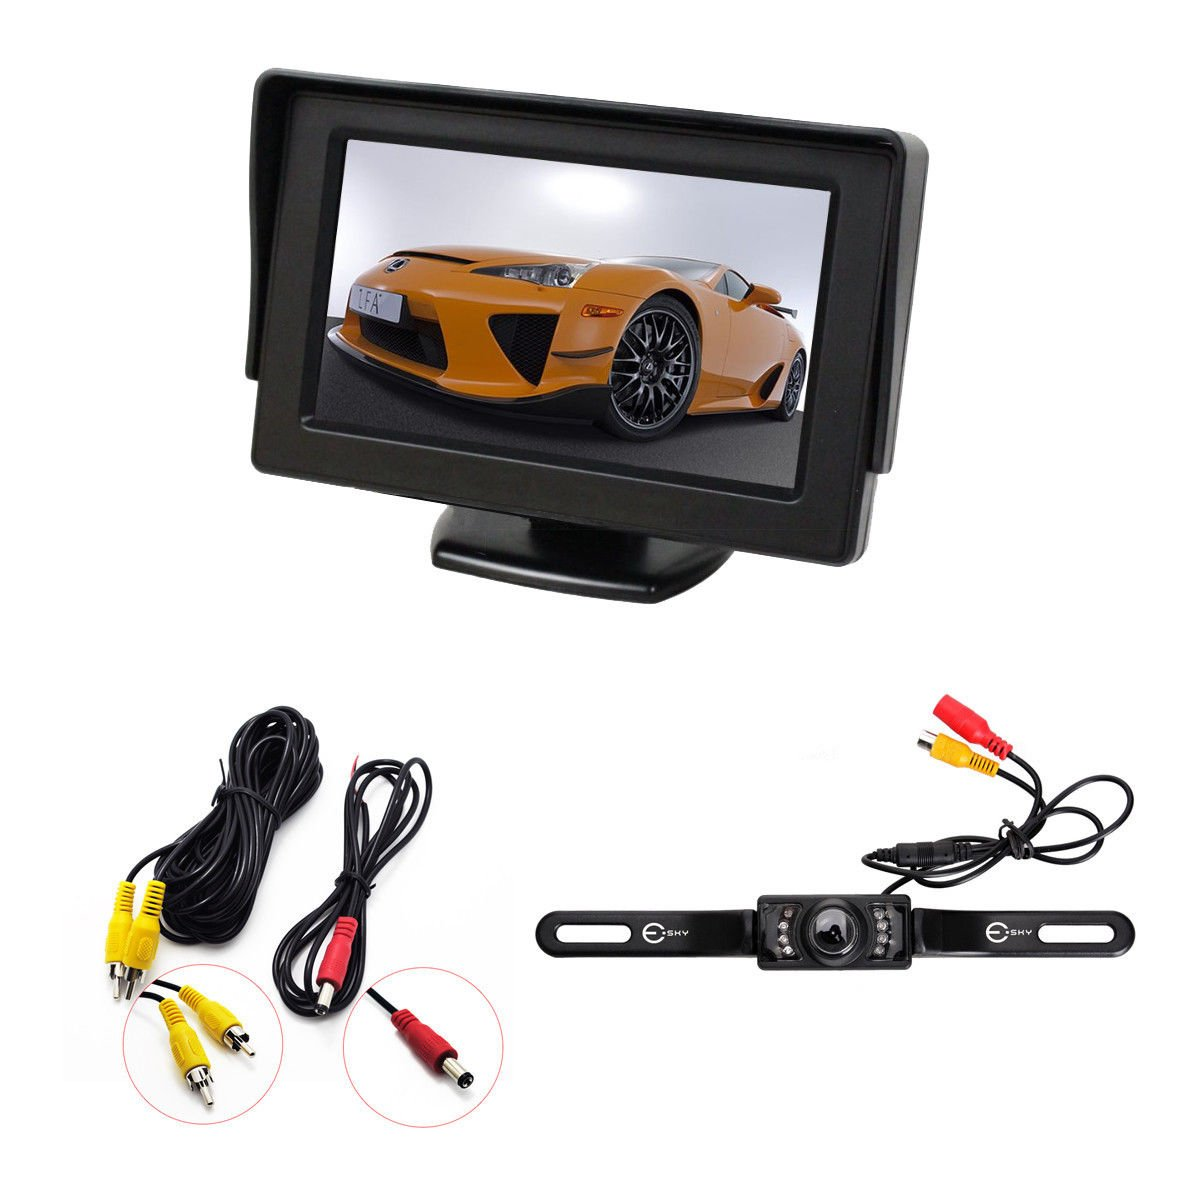 1-4 Inch Color CMOS Car Rear View Backup Reverse Camera 4.3 TFT LCD Monitor